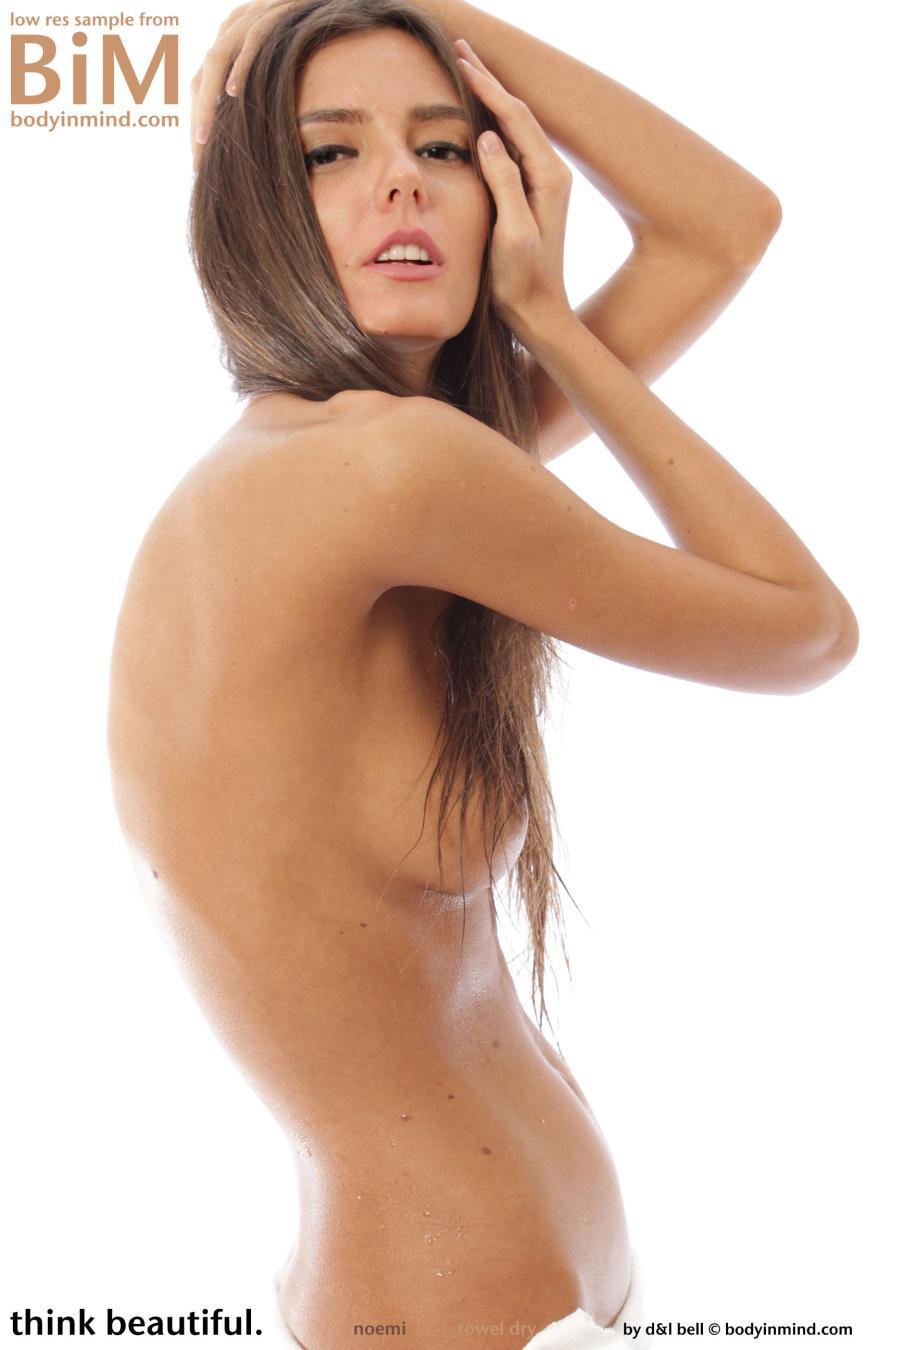 noemi-knappe-brunette-gaat-naakt-06